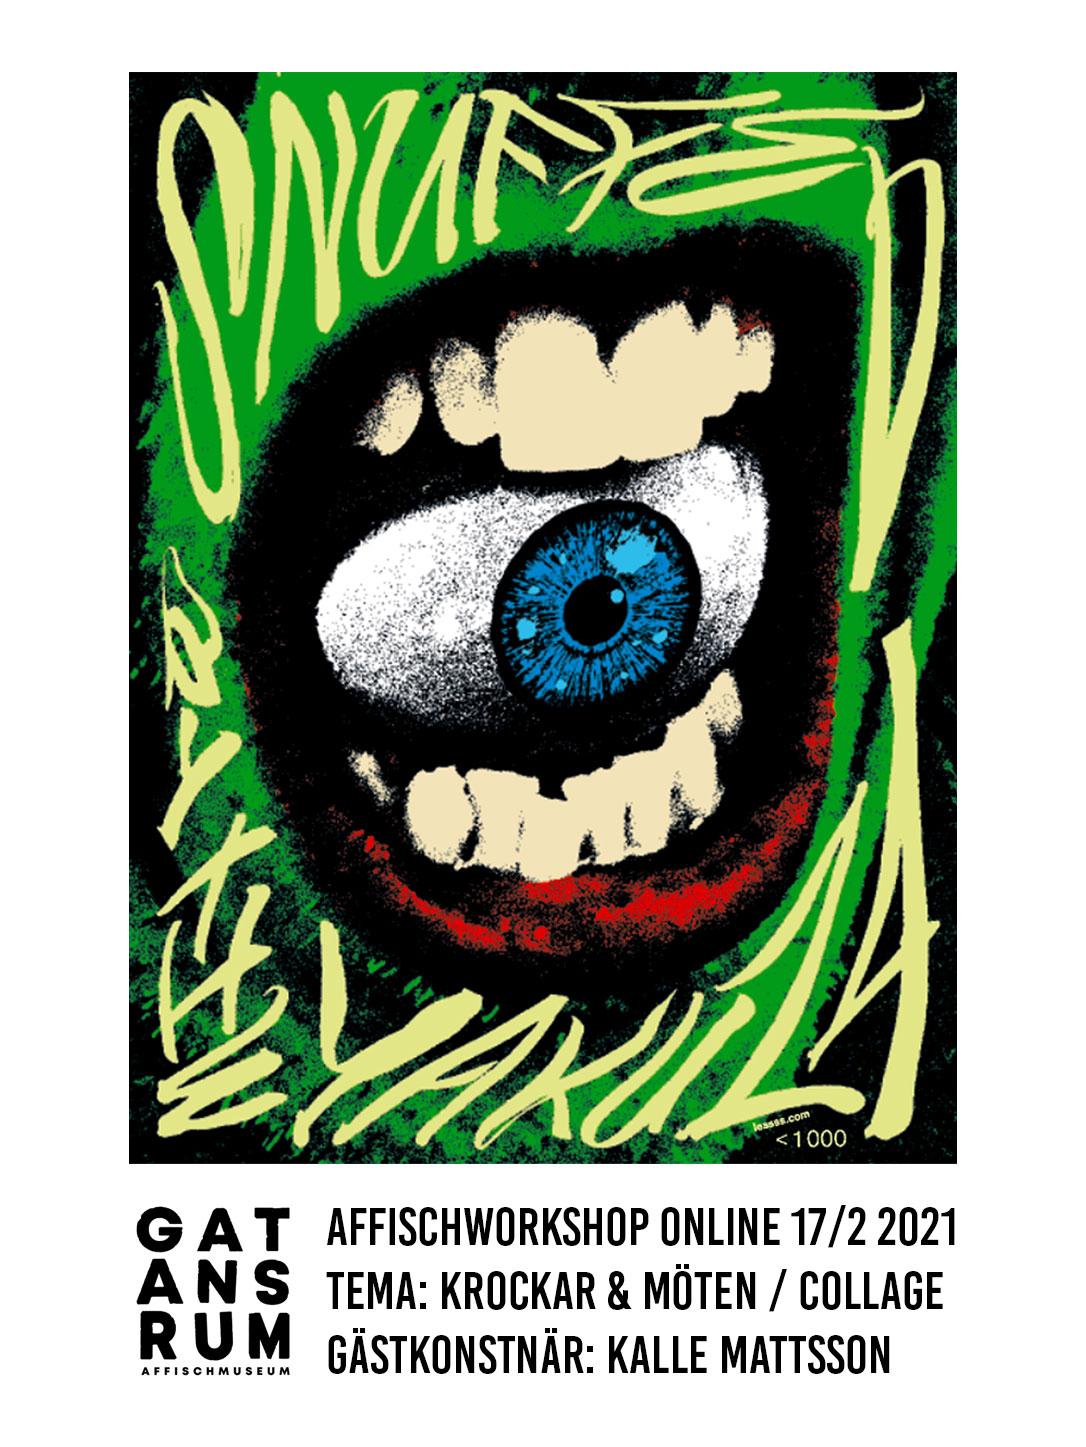 Affischworkshop online 17/2 med Gatans Rum & Kalle Mattsson